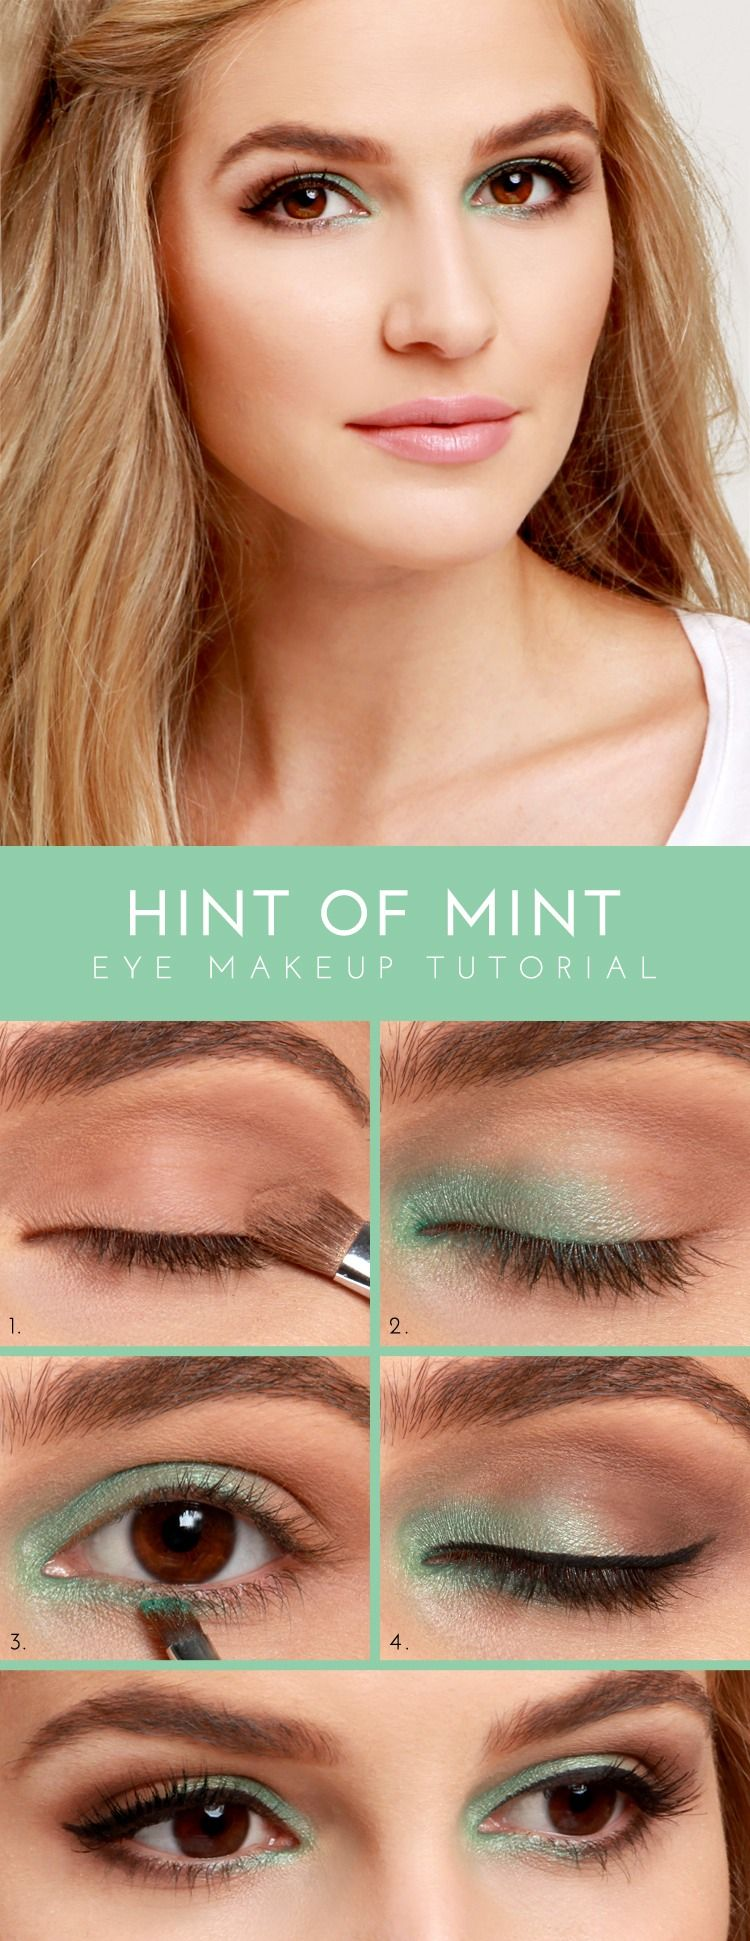 Step By Step Pop Of Color Eye Makeup!